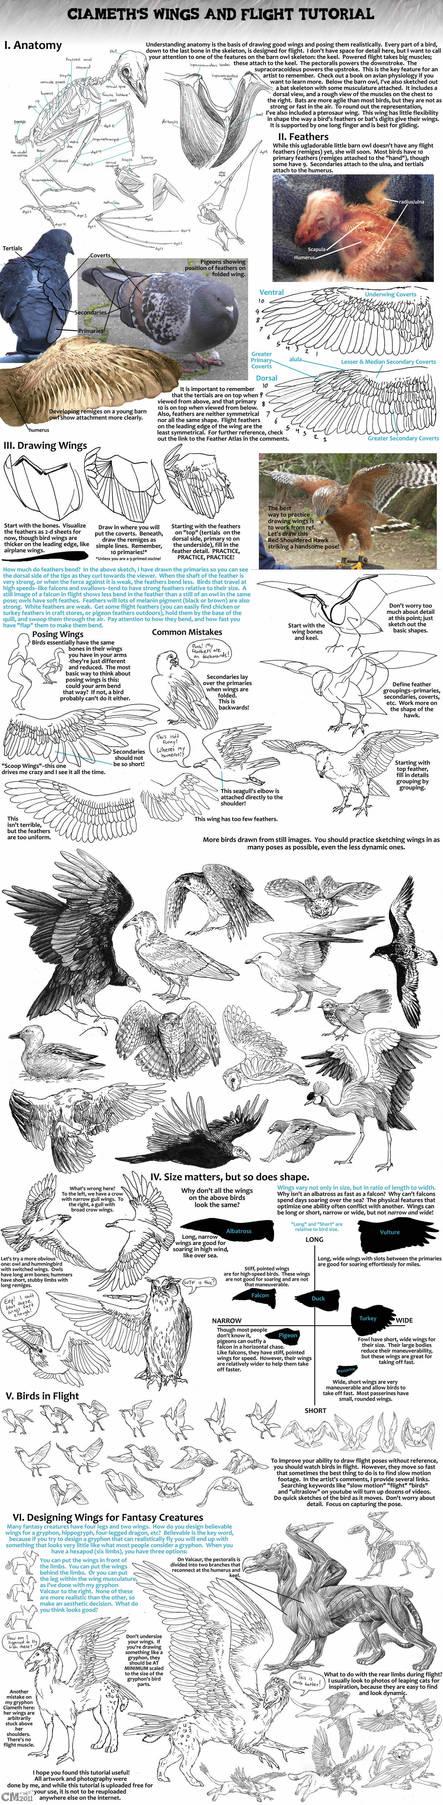 Ciameth's Wing Tutorial by Ciameth